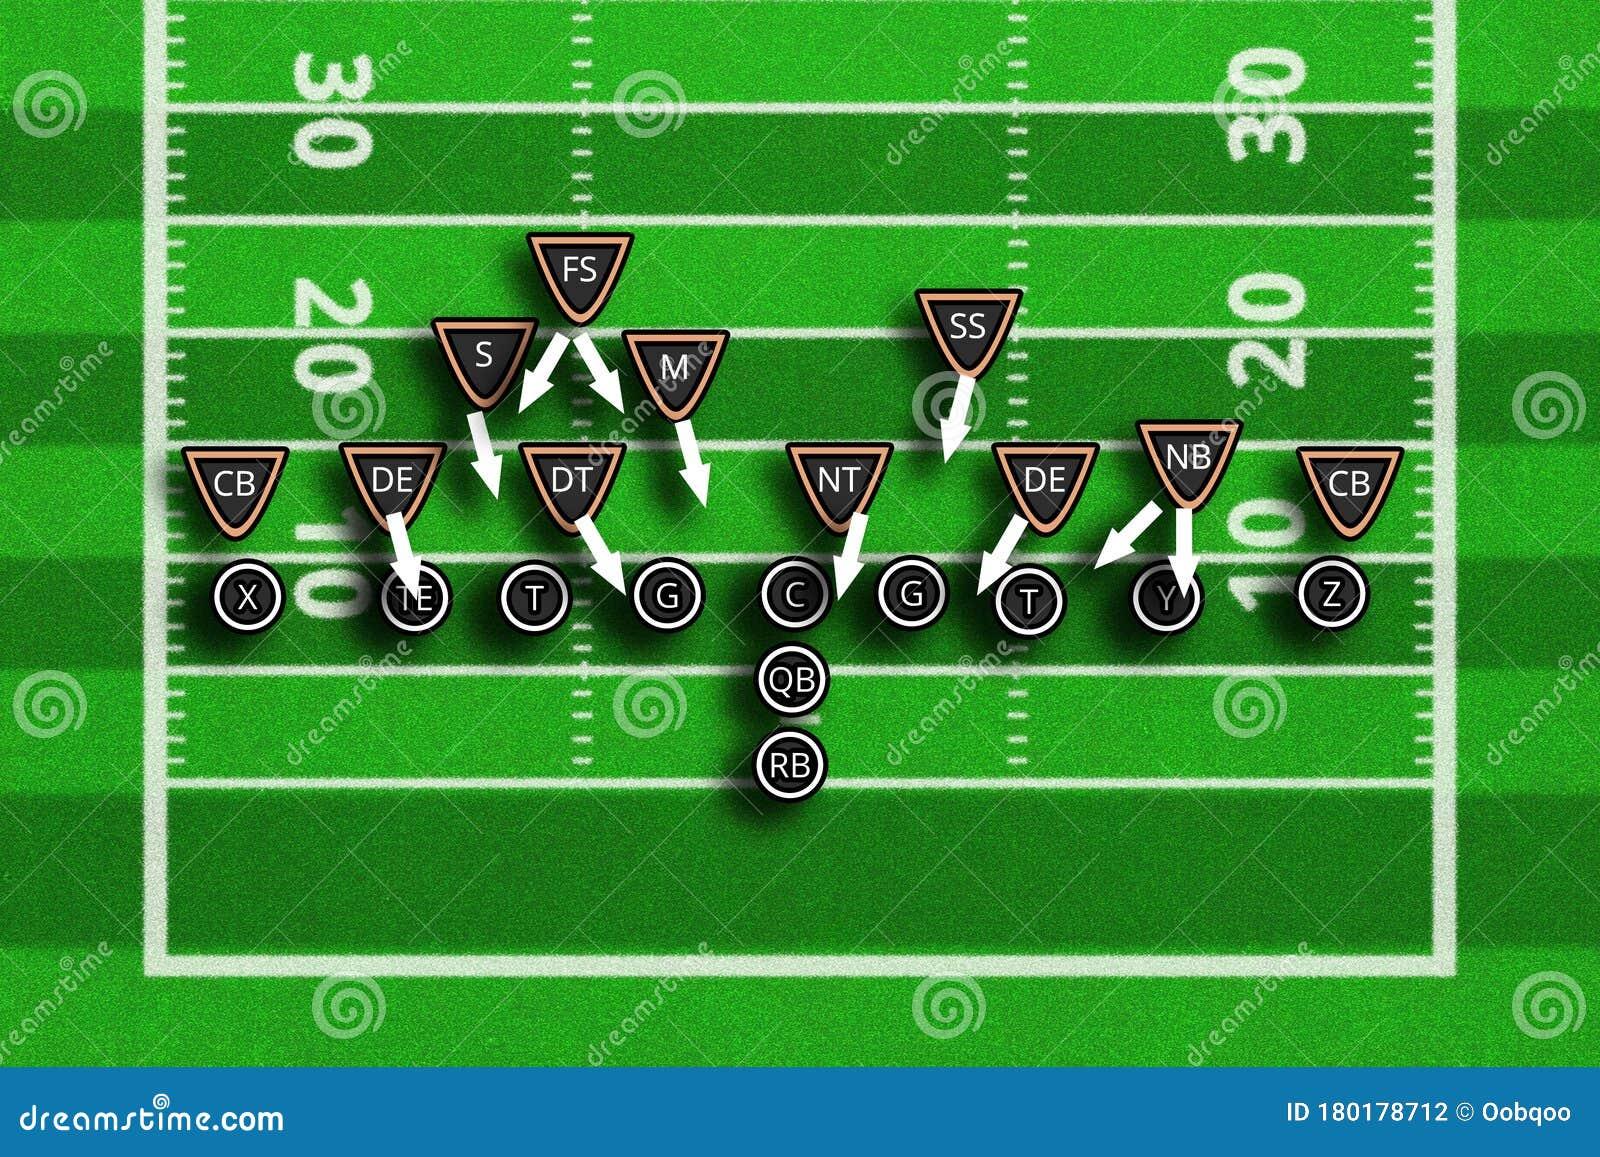 Diagram Football Play Stock Illustrations 635 Diagram Football Play Stock Illustrations Vectors Clipart Dreamstime